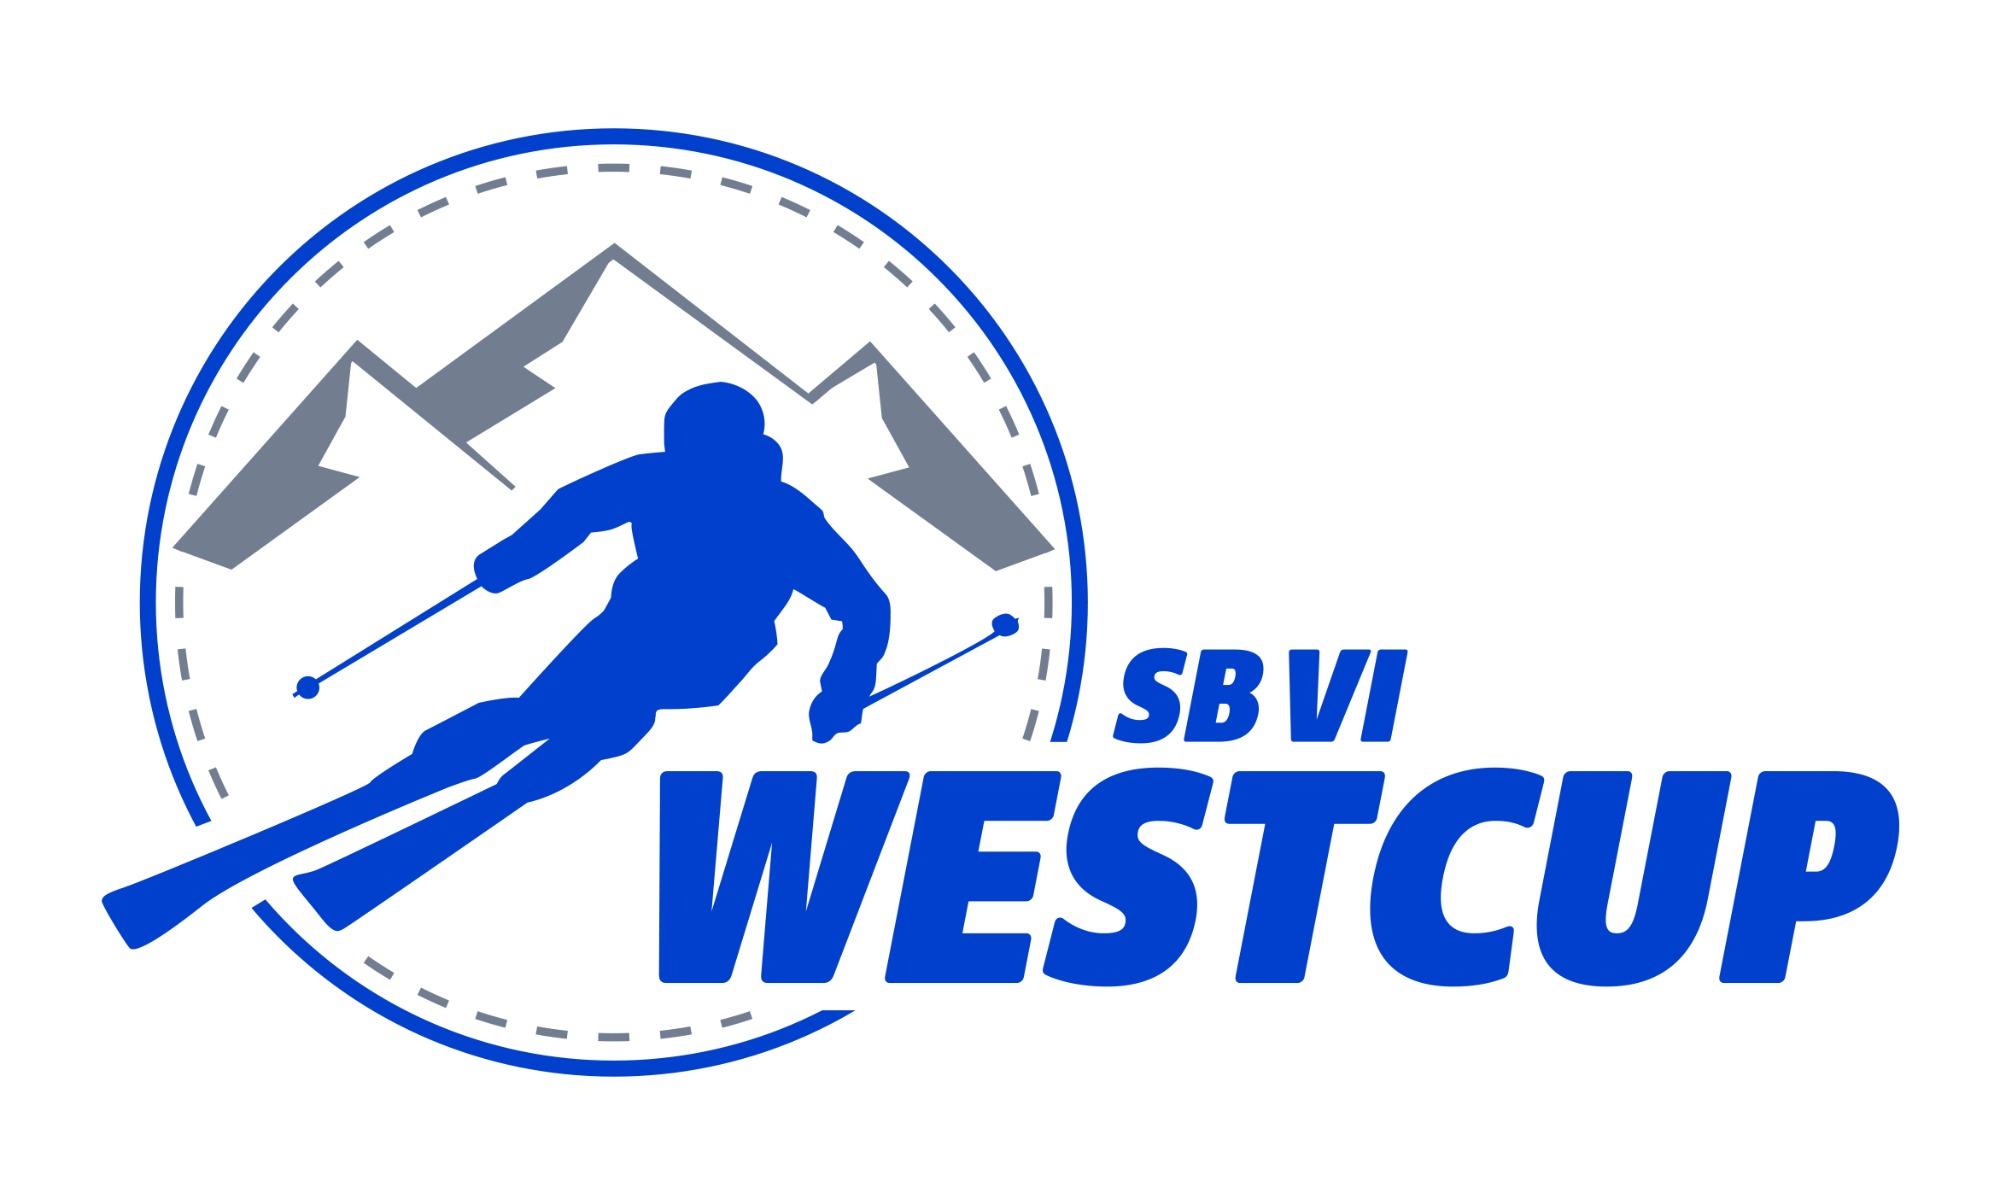 Lg westcup